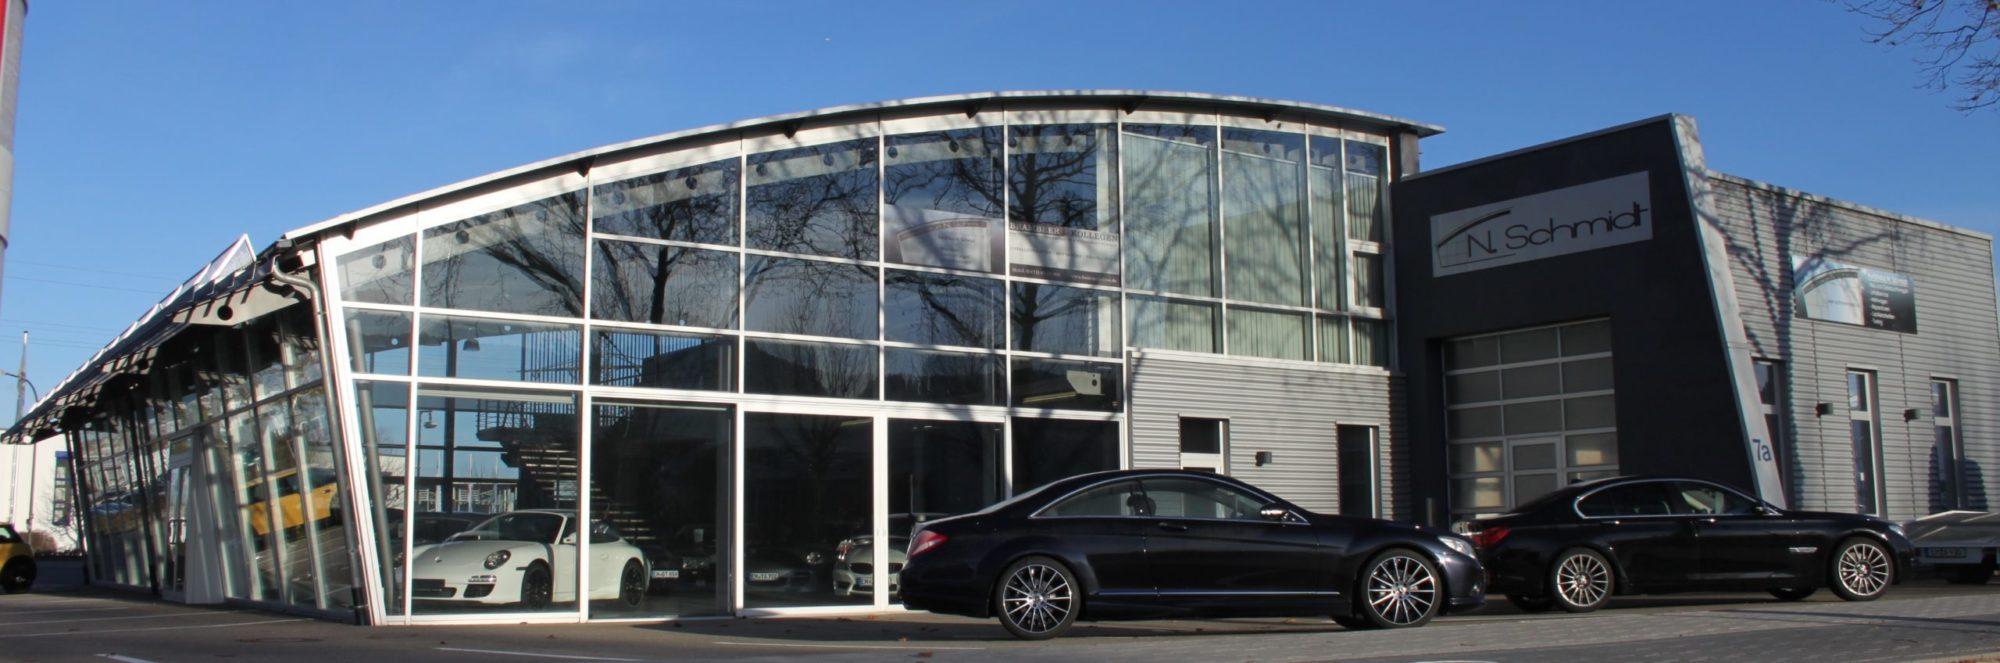 AutohausNSchmidt.de